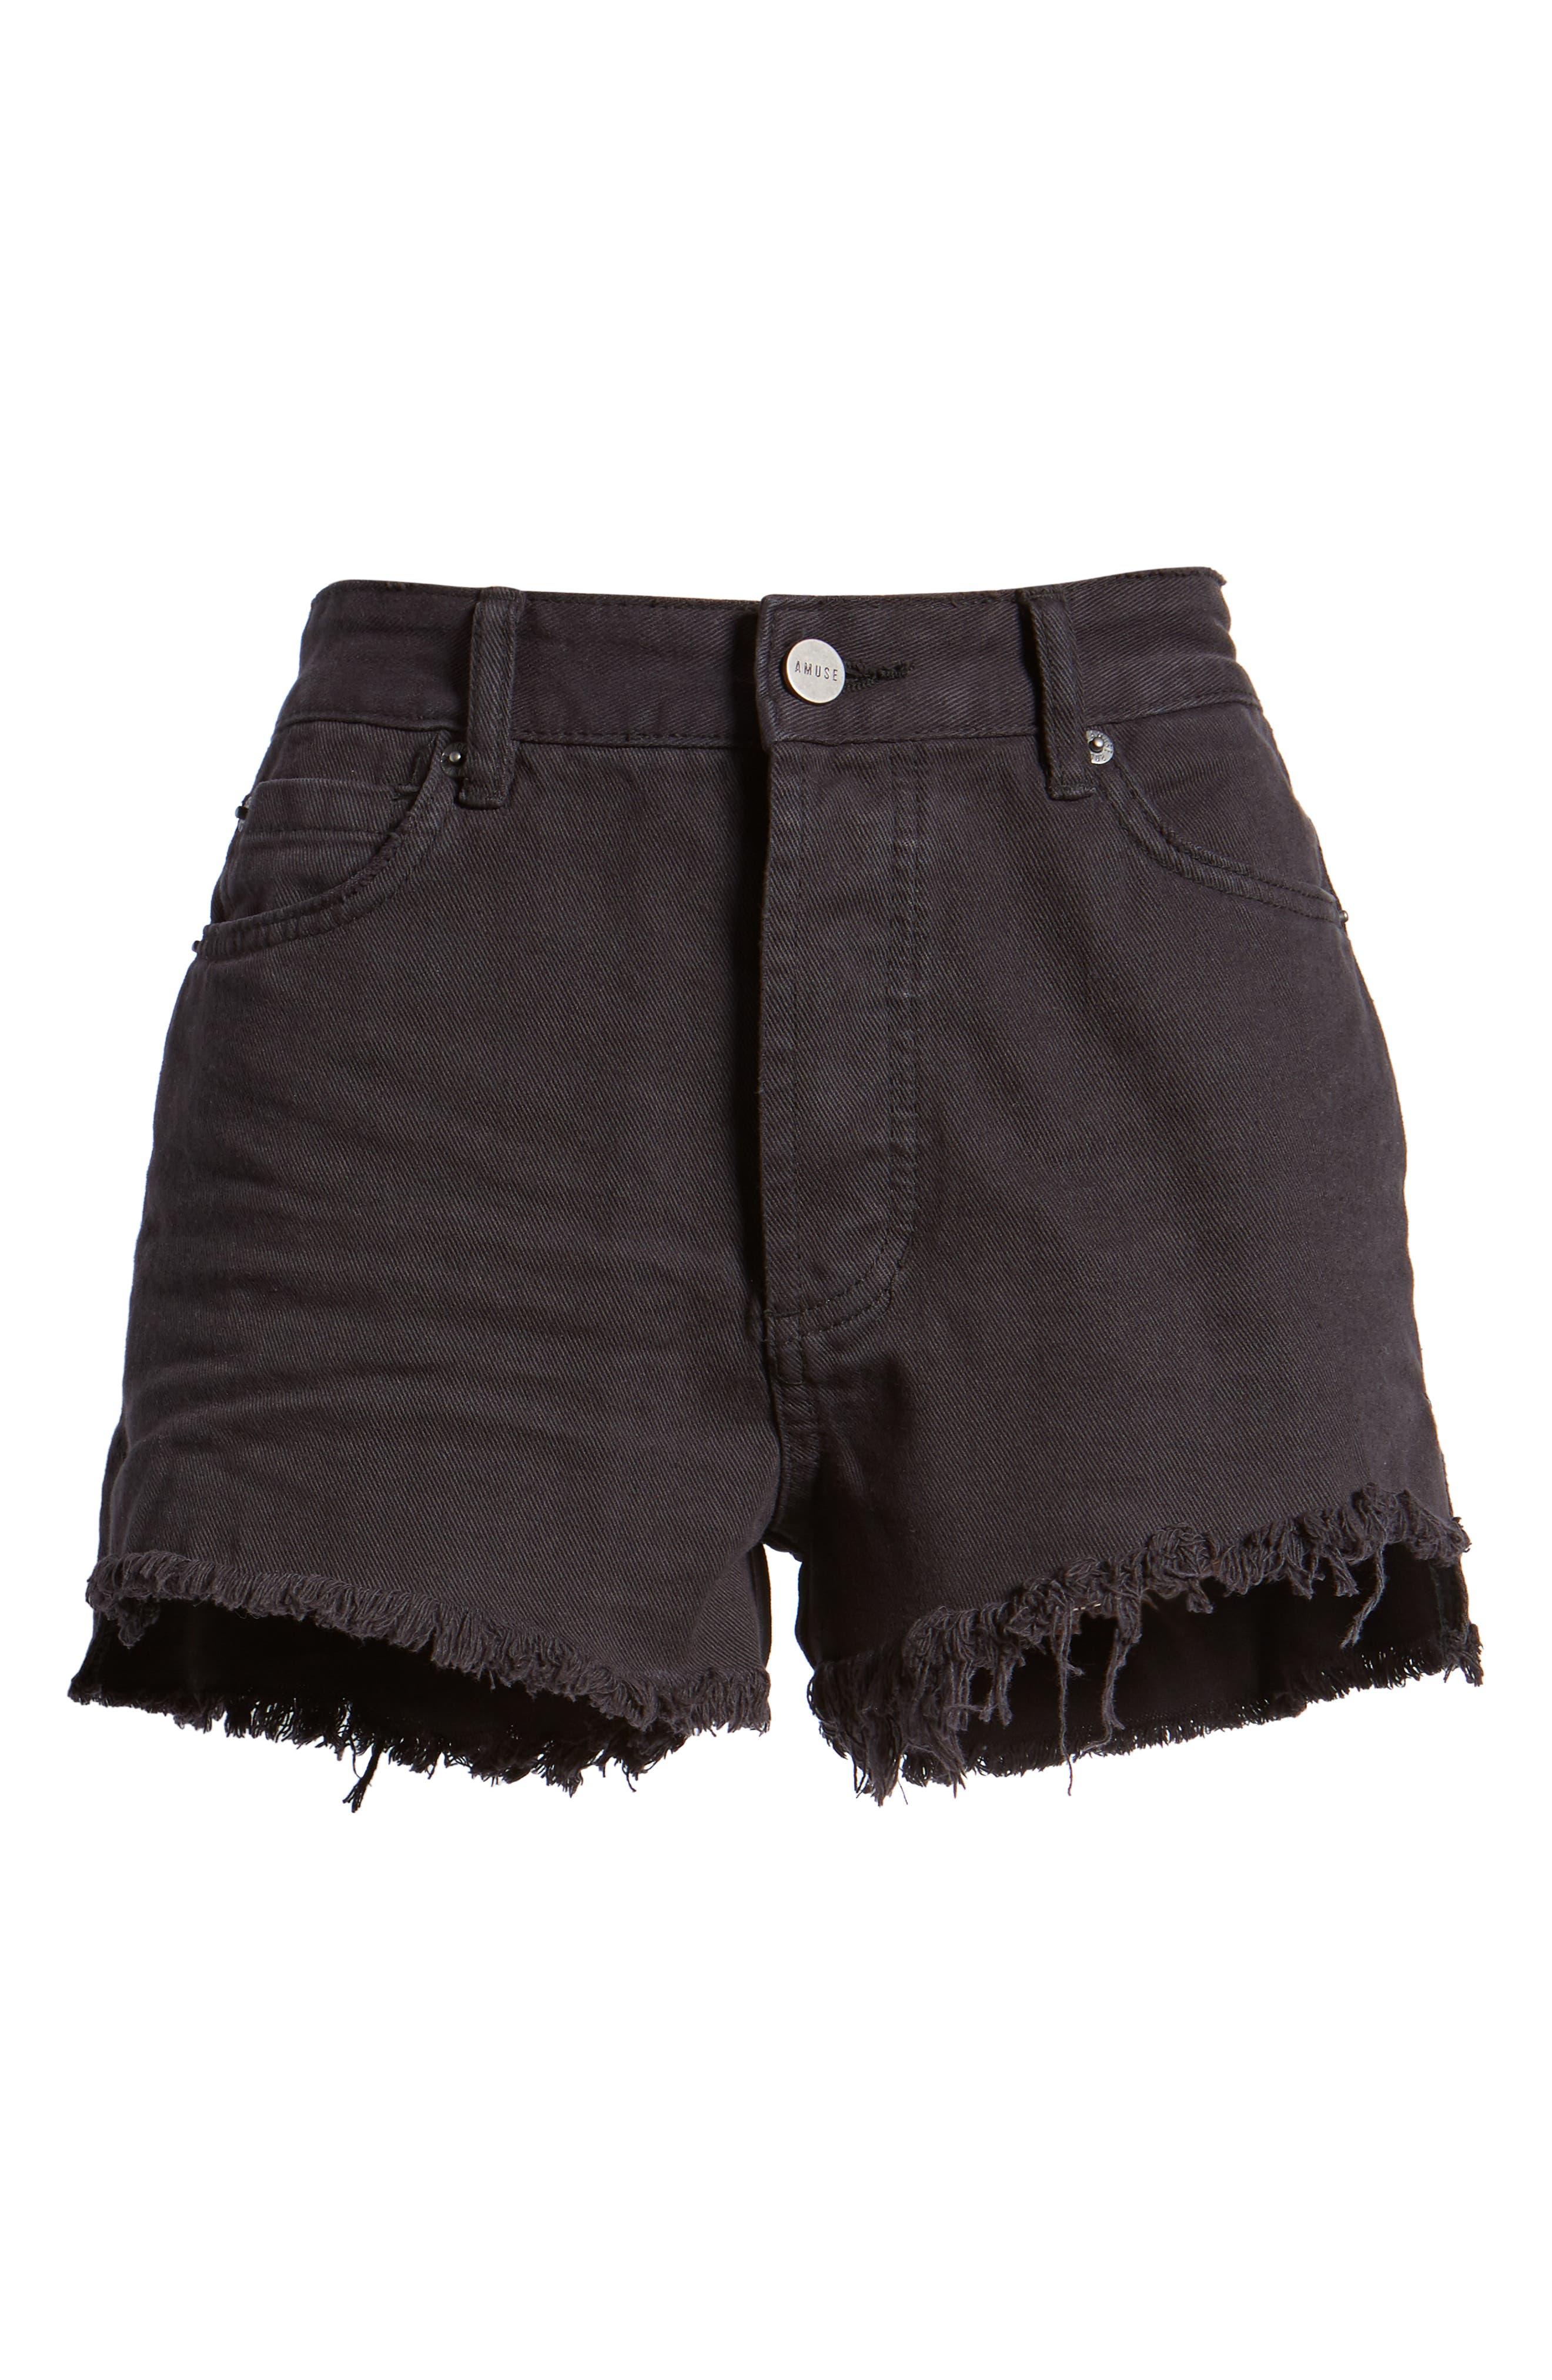 Shoreline Fray Hem Denim Shorts,                             Alternate thumbnail 7, color,                             001